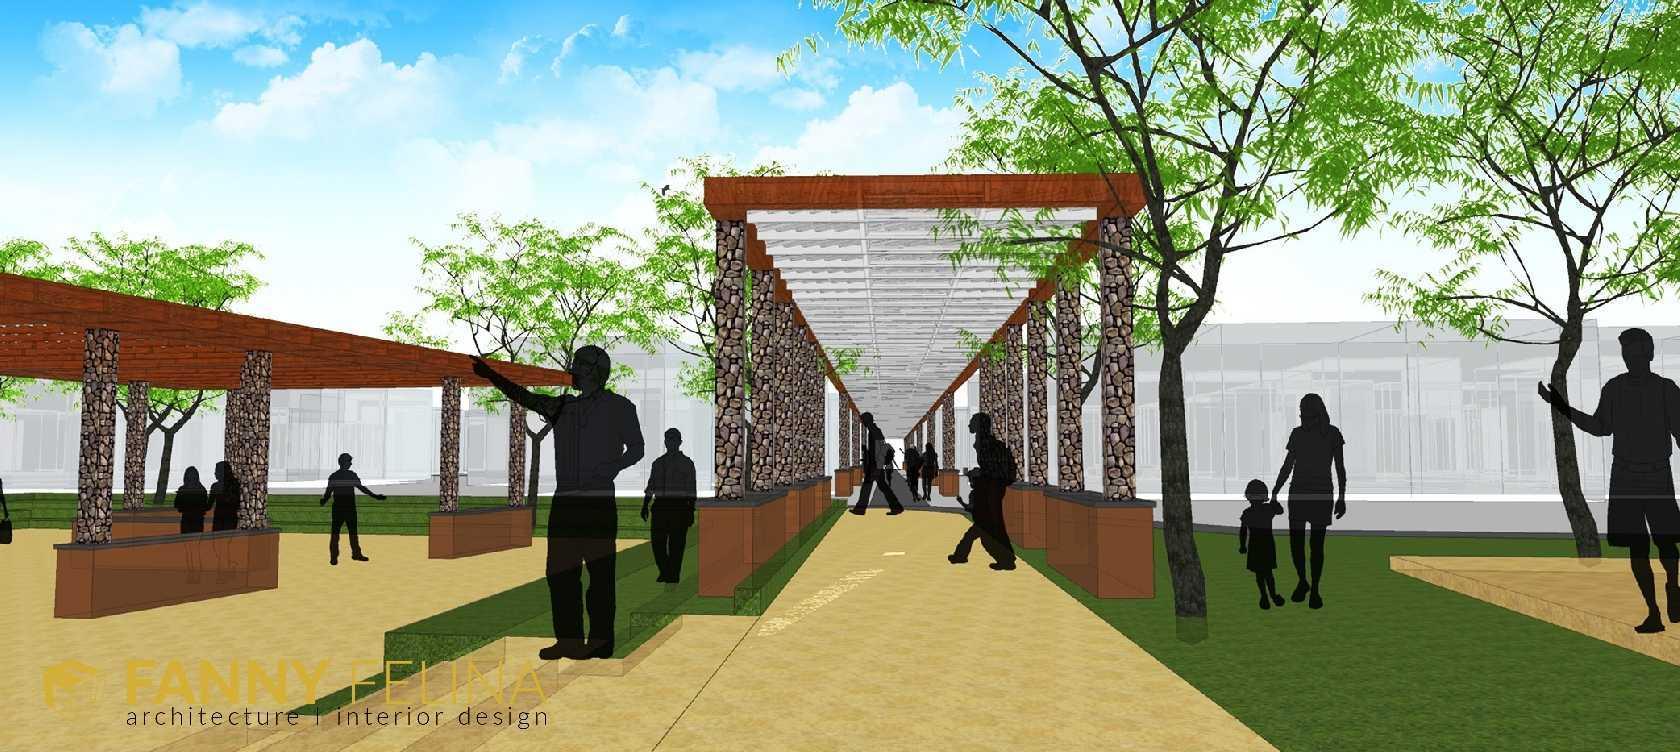 Fanny Felina Architecture & Interior Design Grha Batik Gedhog Di Desa Kedungrejo Kabupaten Tuban, Jawa Timur, Indonesia  01-26 Traditional,tradisional,wood  37773